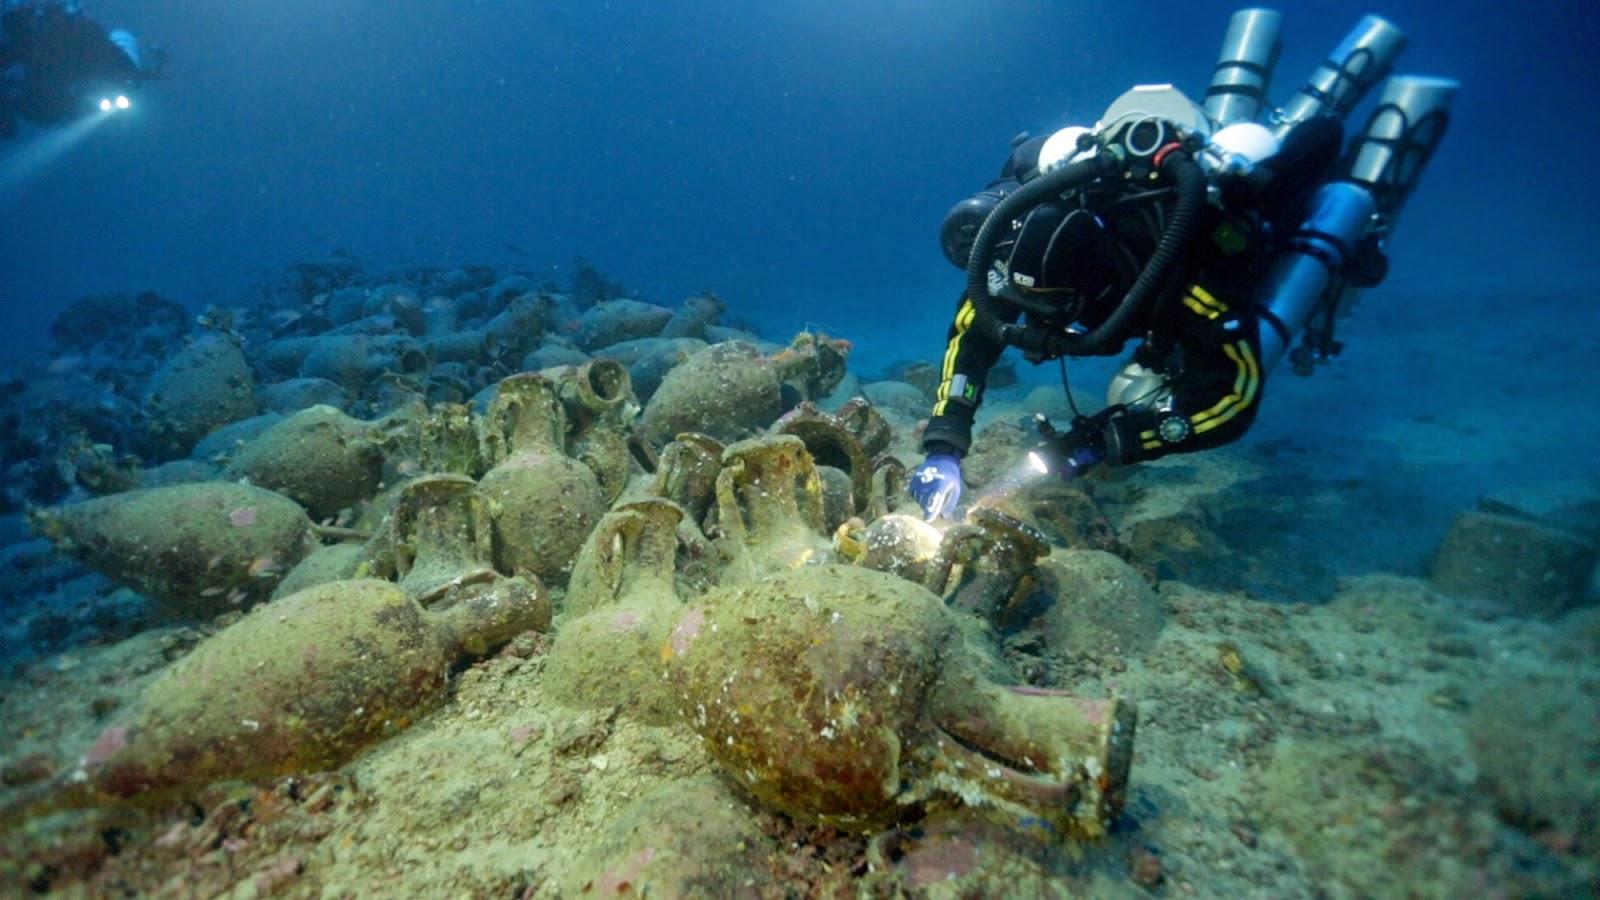 Archeologia subacquea alle Isole Eolie